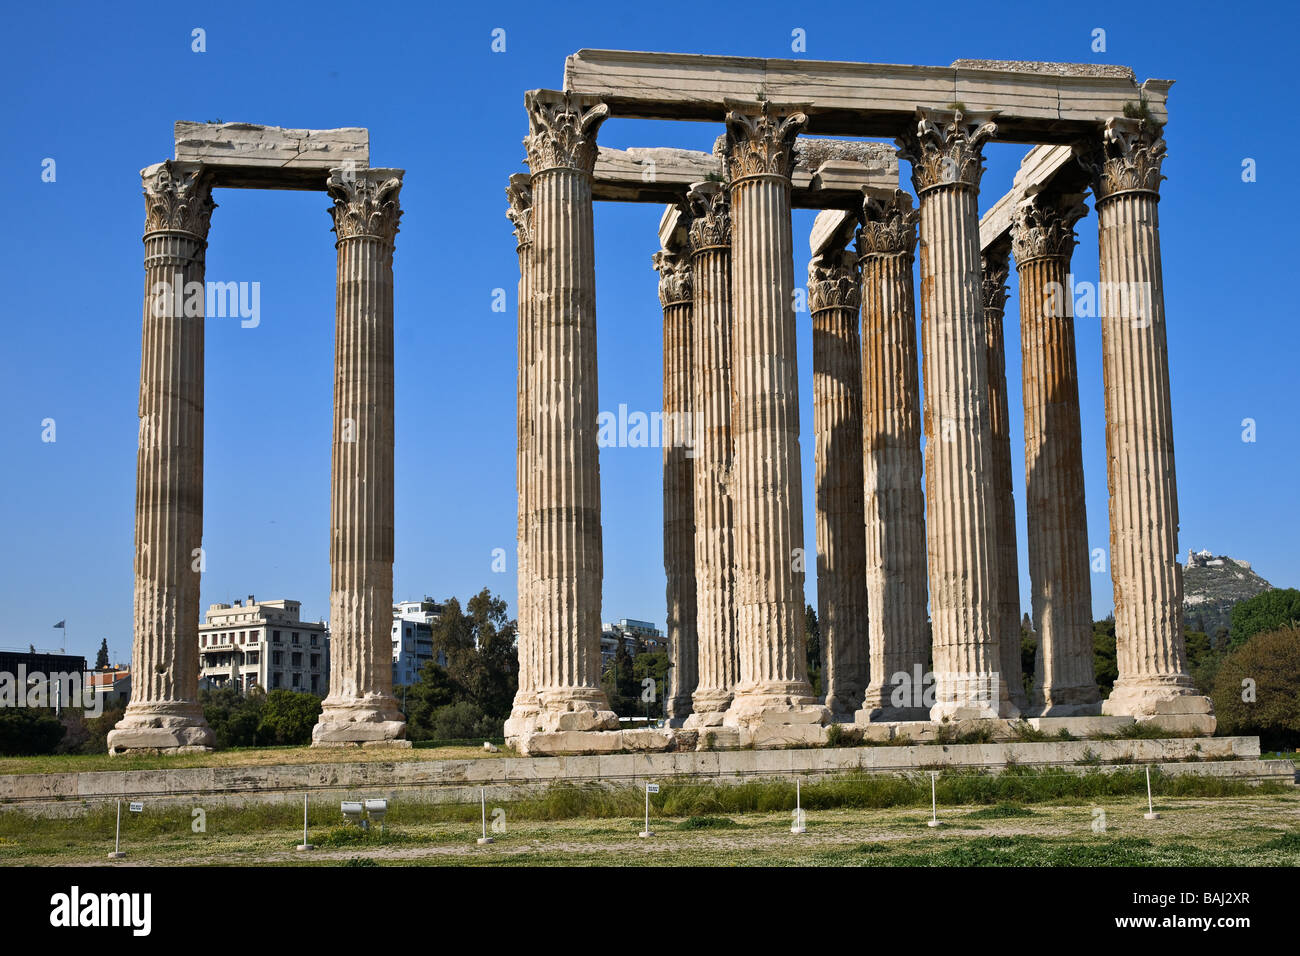 Olympieion, Temple of Olympian Zeus, Athens, Greece - Stock Image